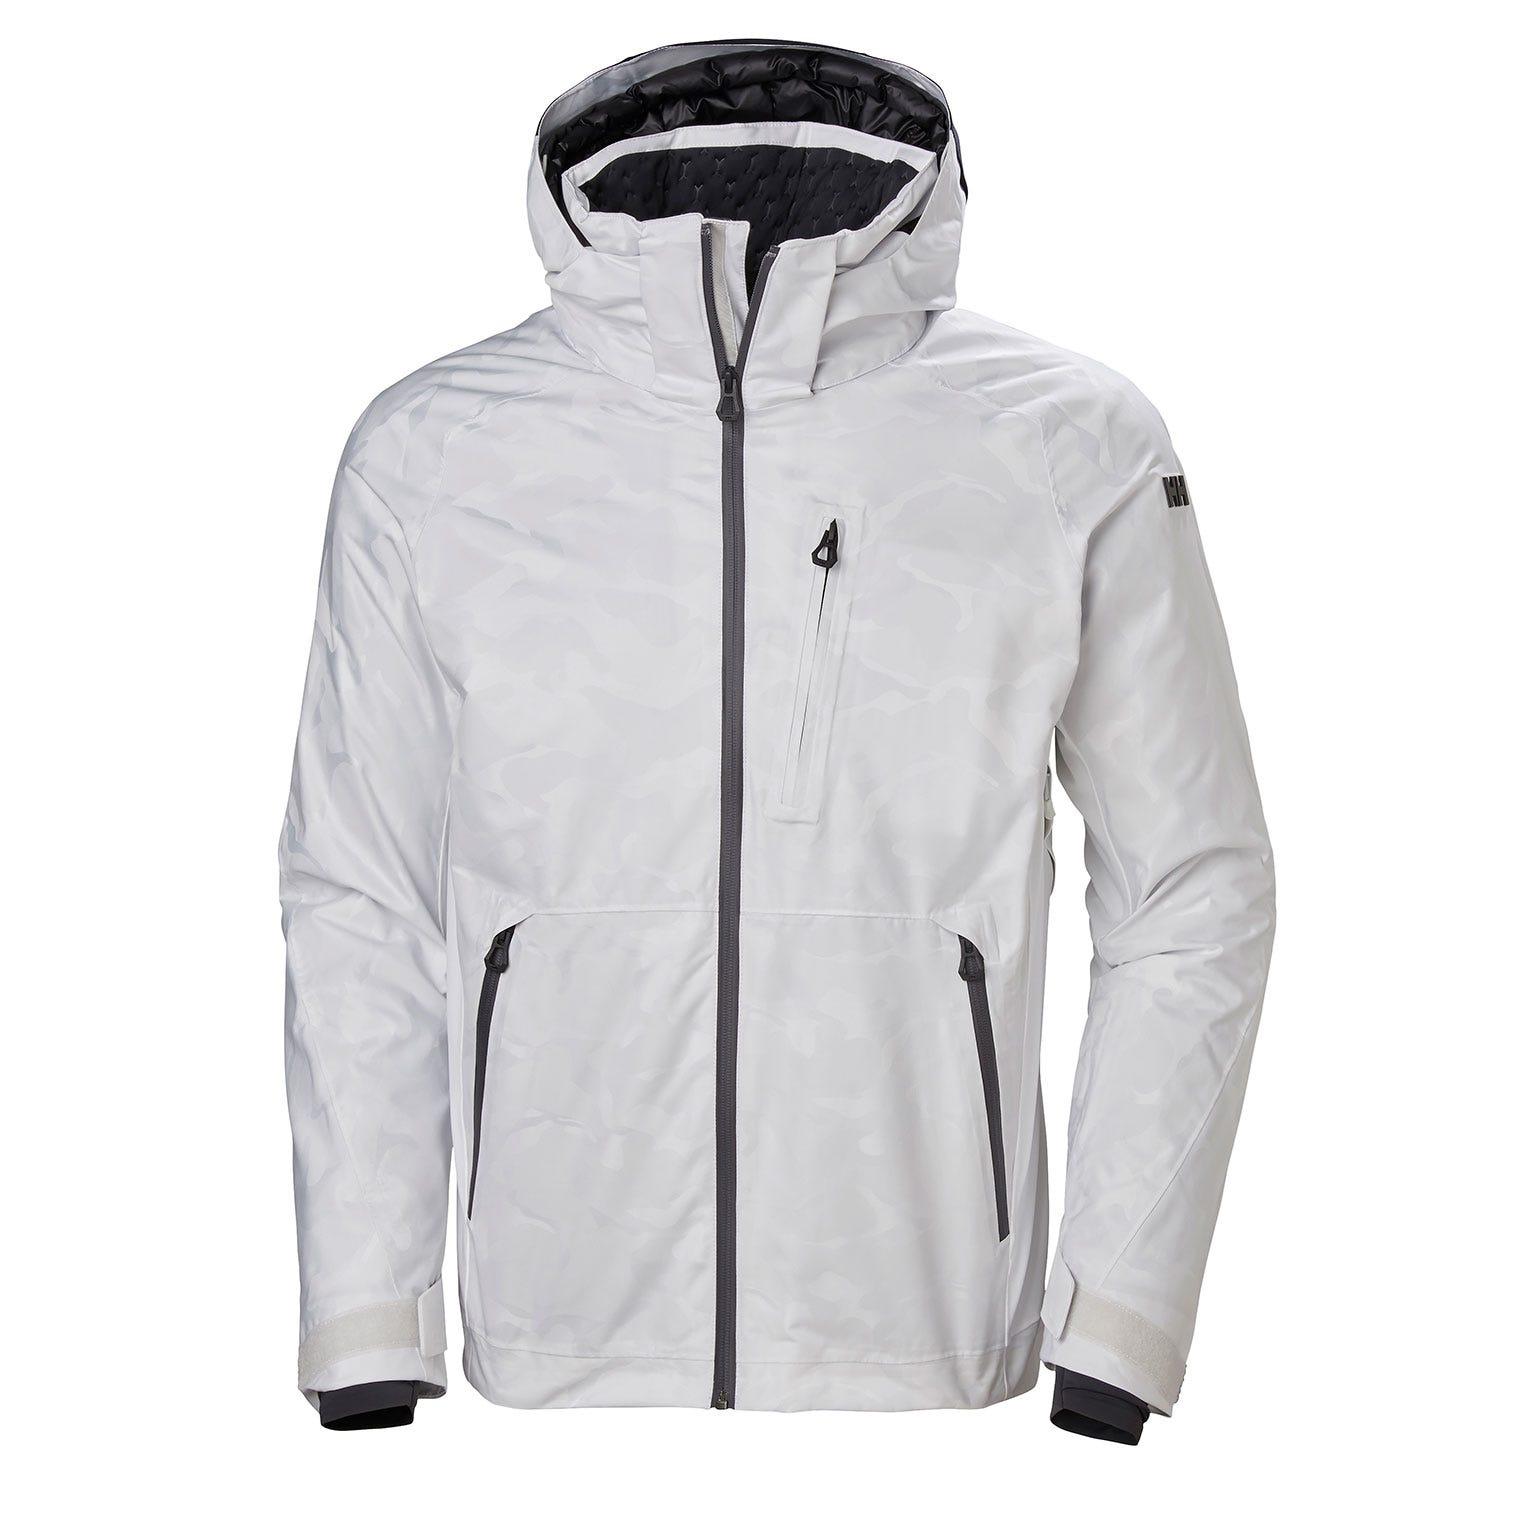 Helly Hansen Skistar Jacket Mens White M